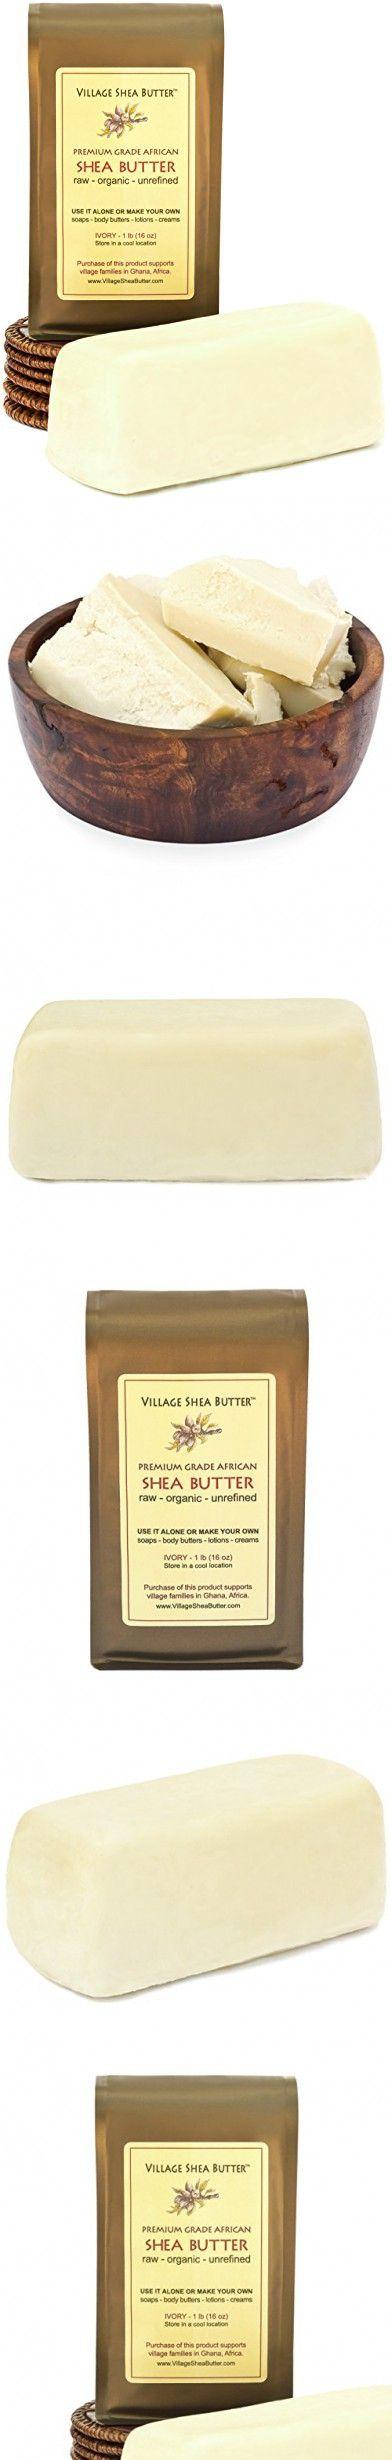 Village Shea Butter Raw Organic Unrefined 1 Lb Raw Organic Shea Butter Unrefined